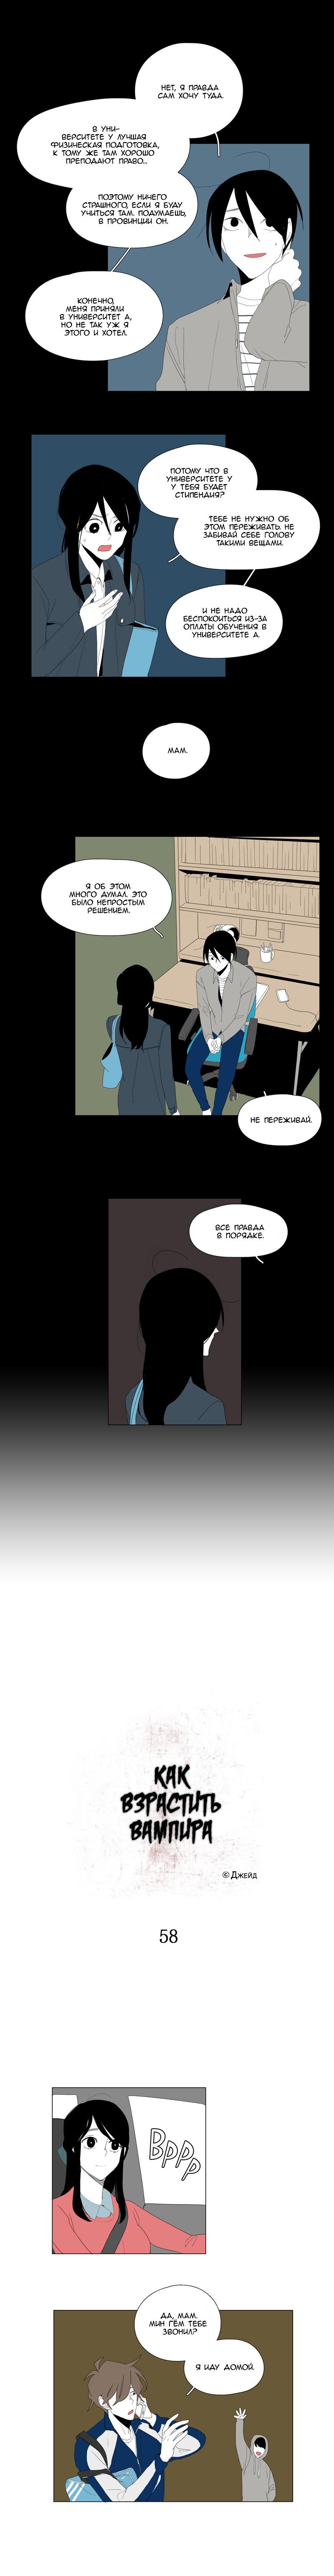 https://r1.ninemanga.com/comics/pic2/33/27873/333362/150471462491.jpg Page 4